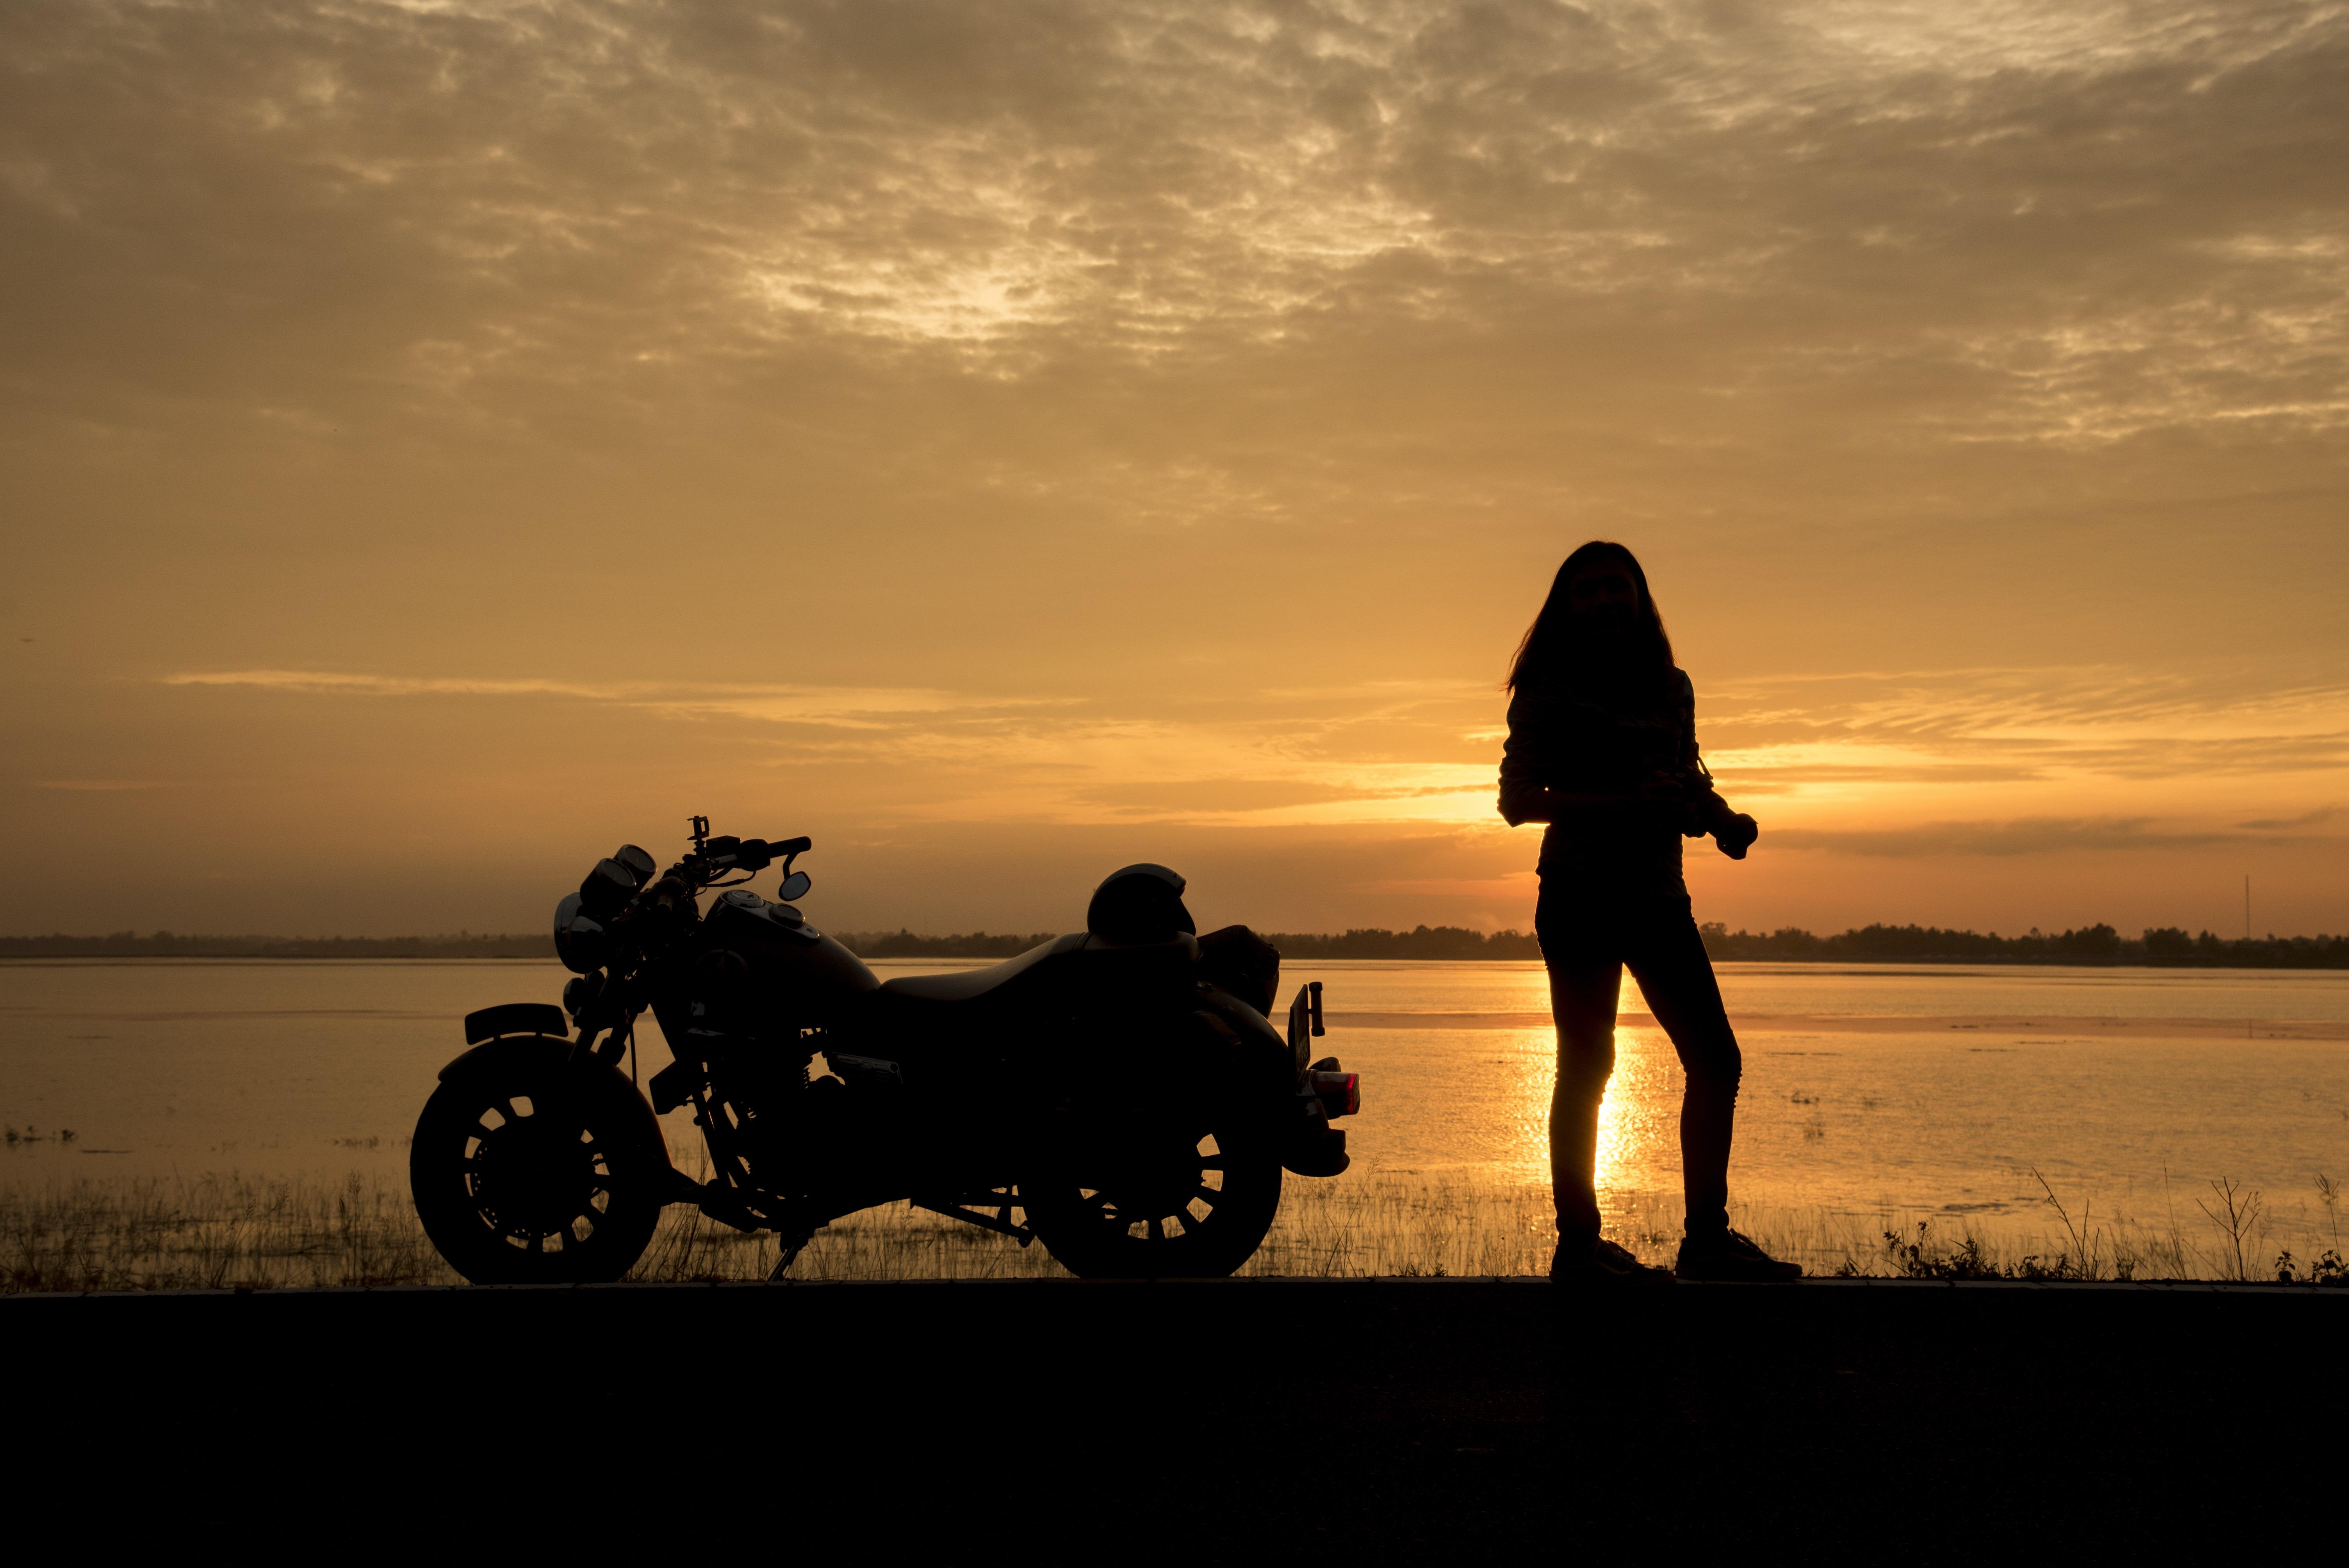 Motorcycle road trip planning